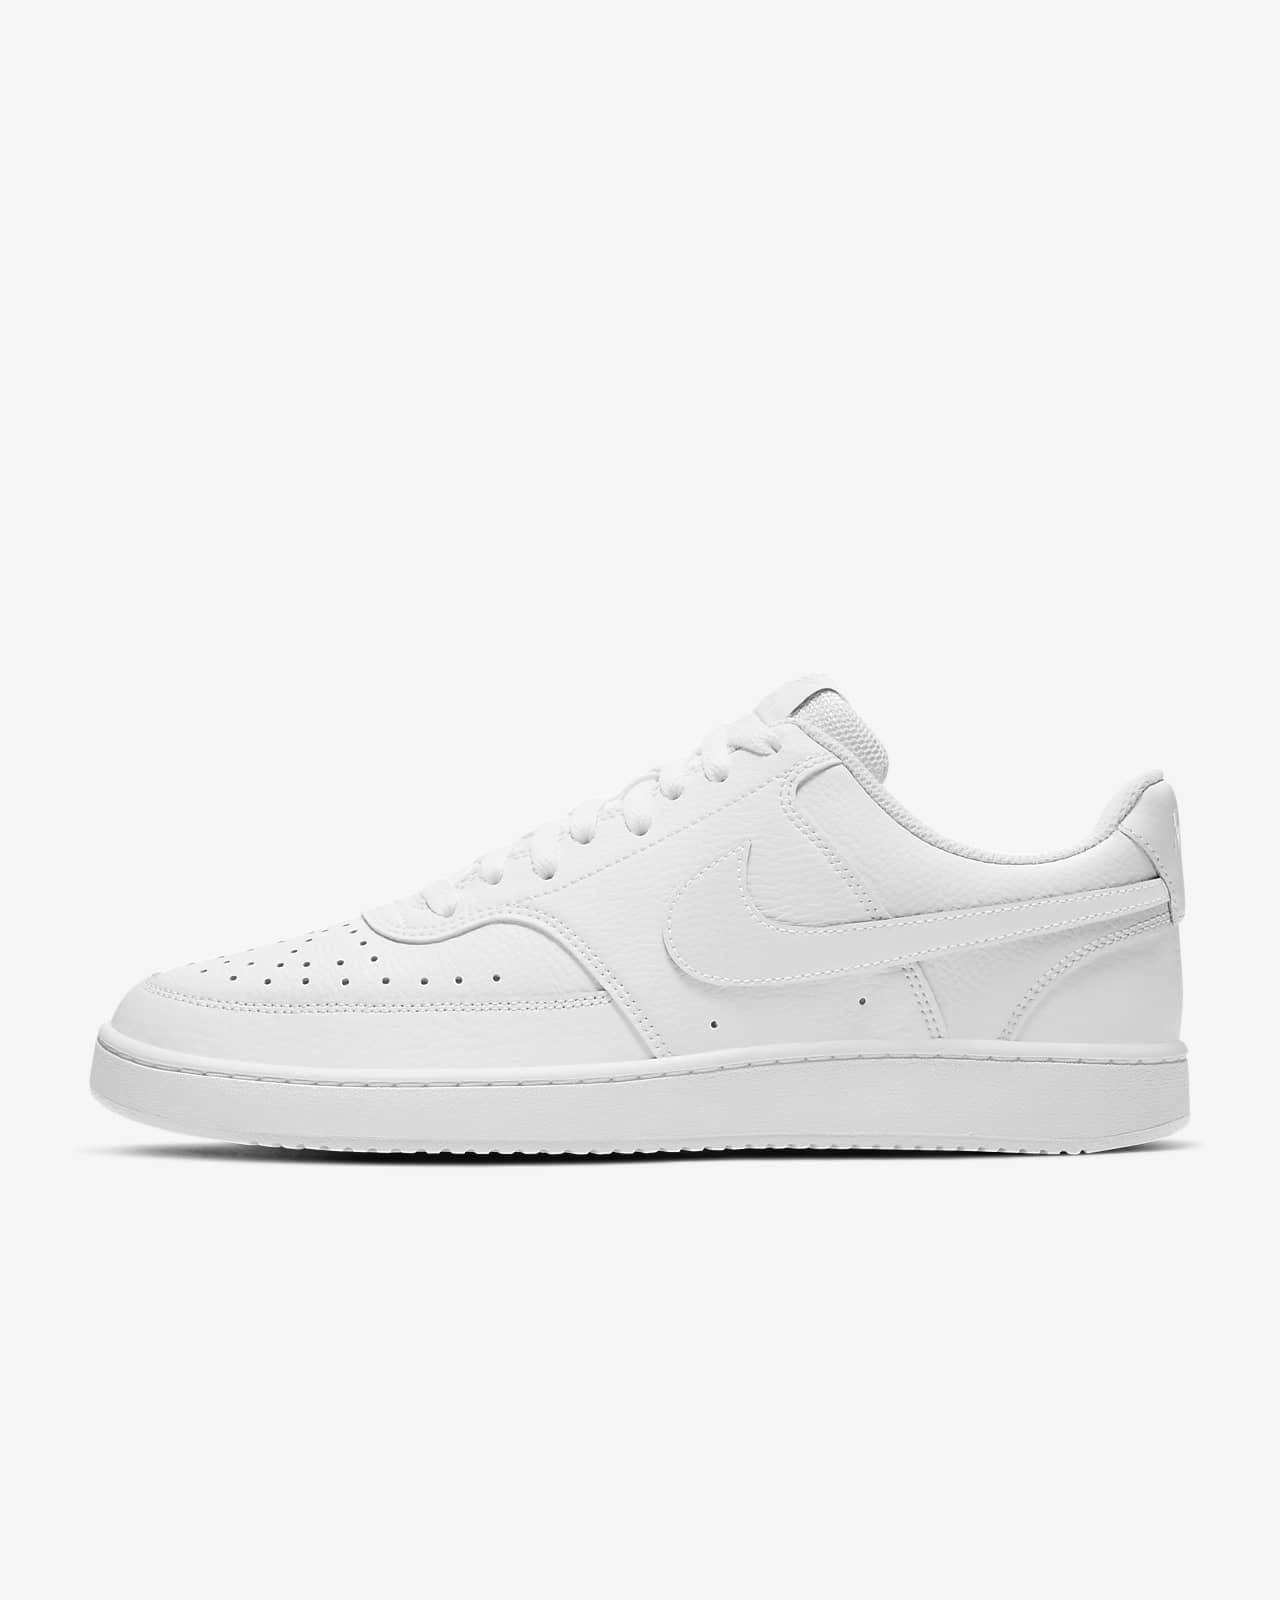 Chaussure Nike Court Vision Low. Nike LU